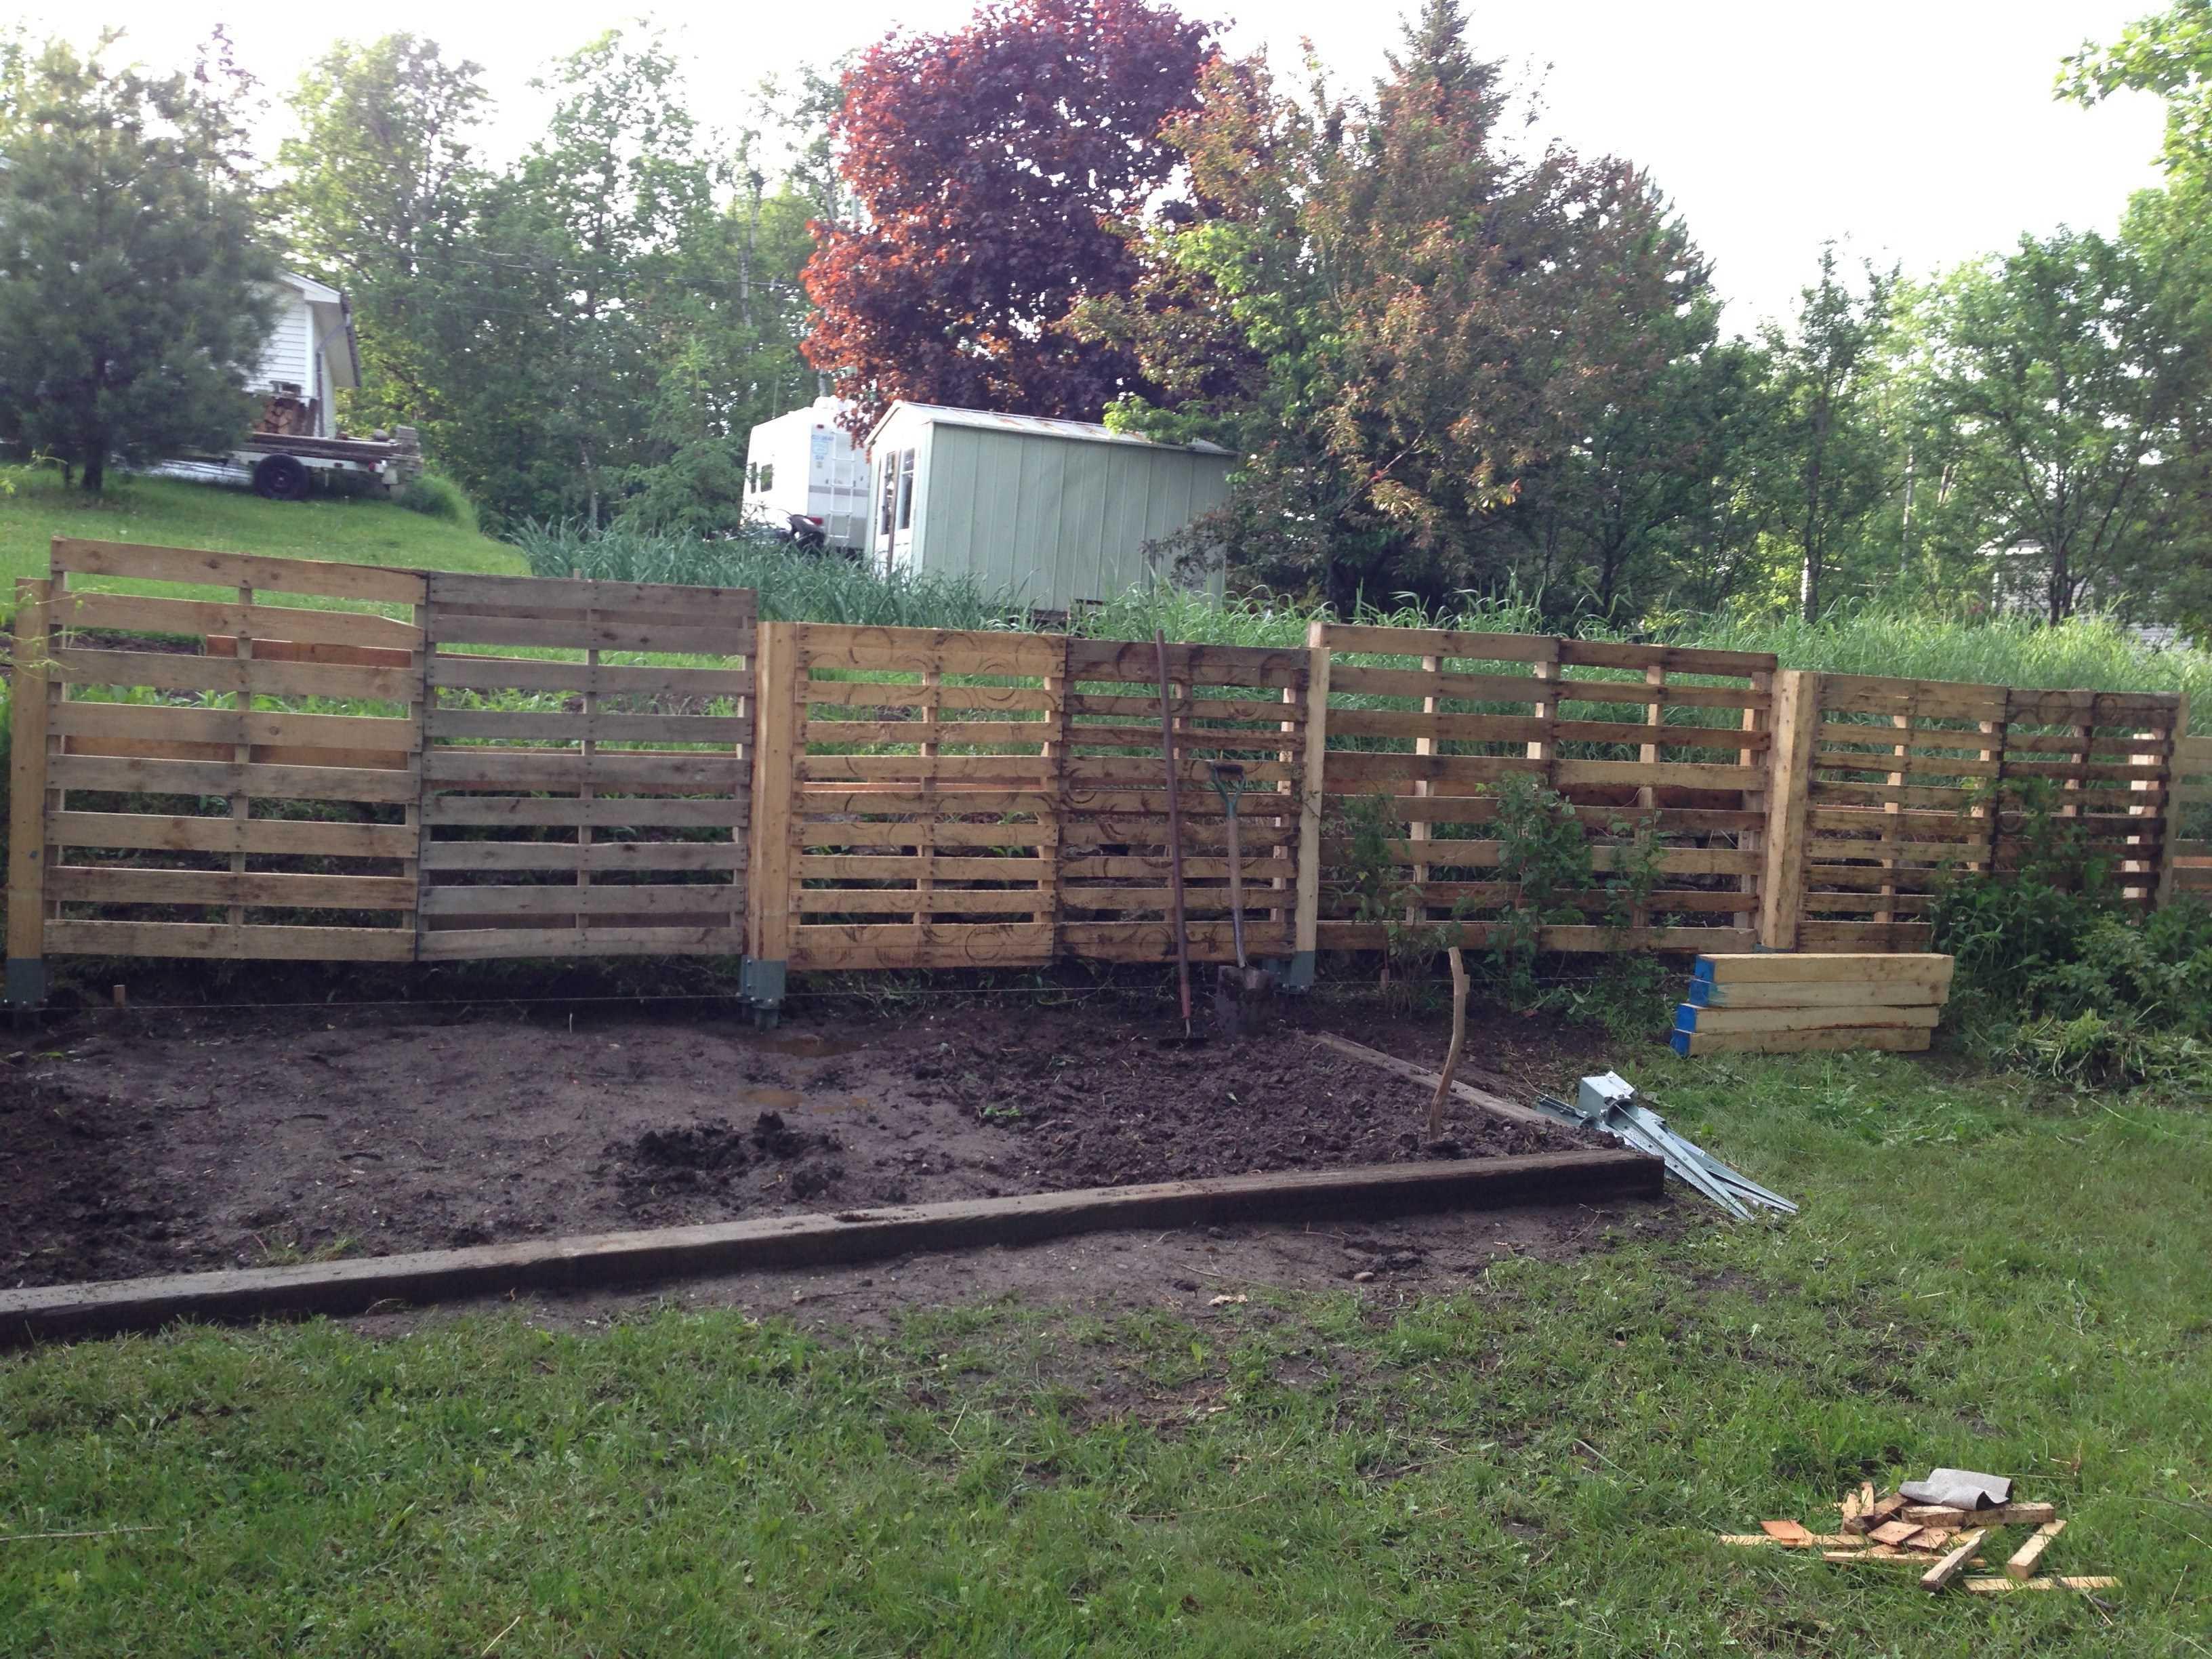 1001pallets-com-pallet-fence-2